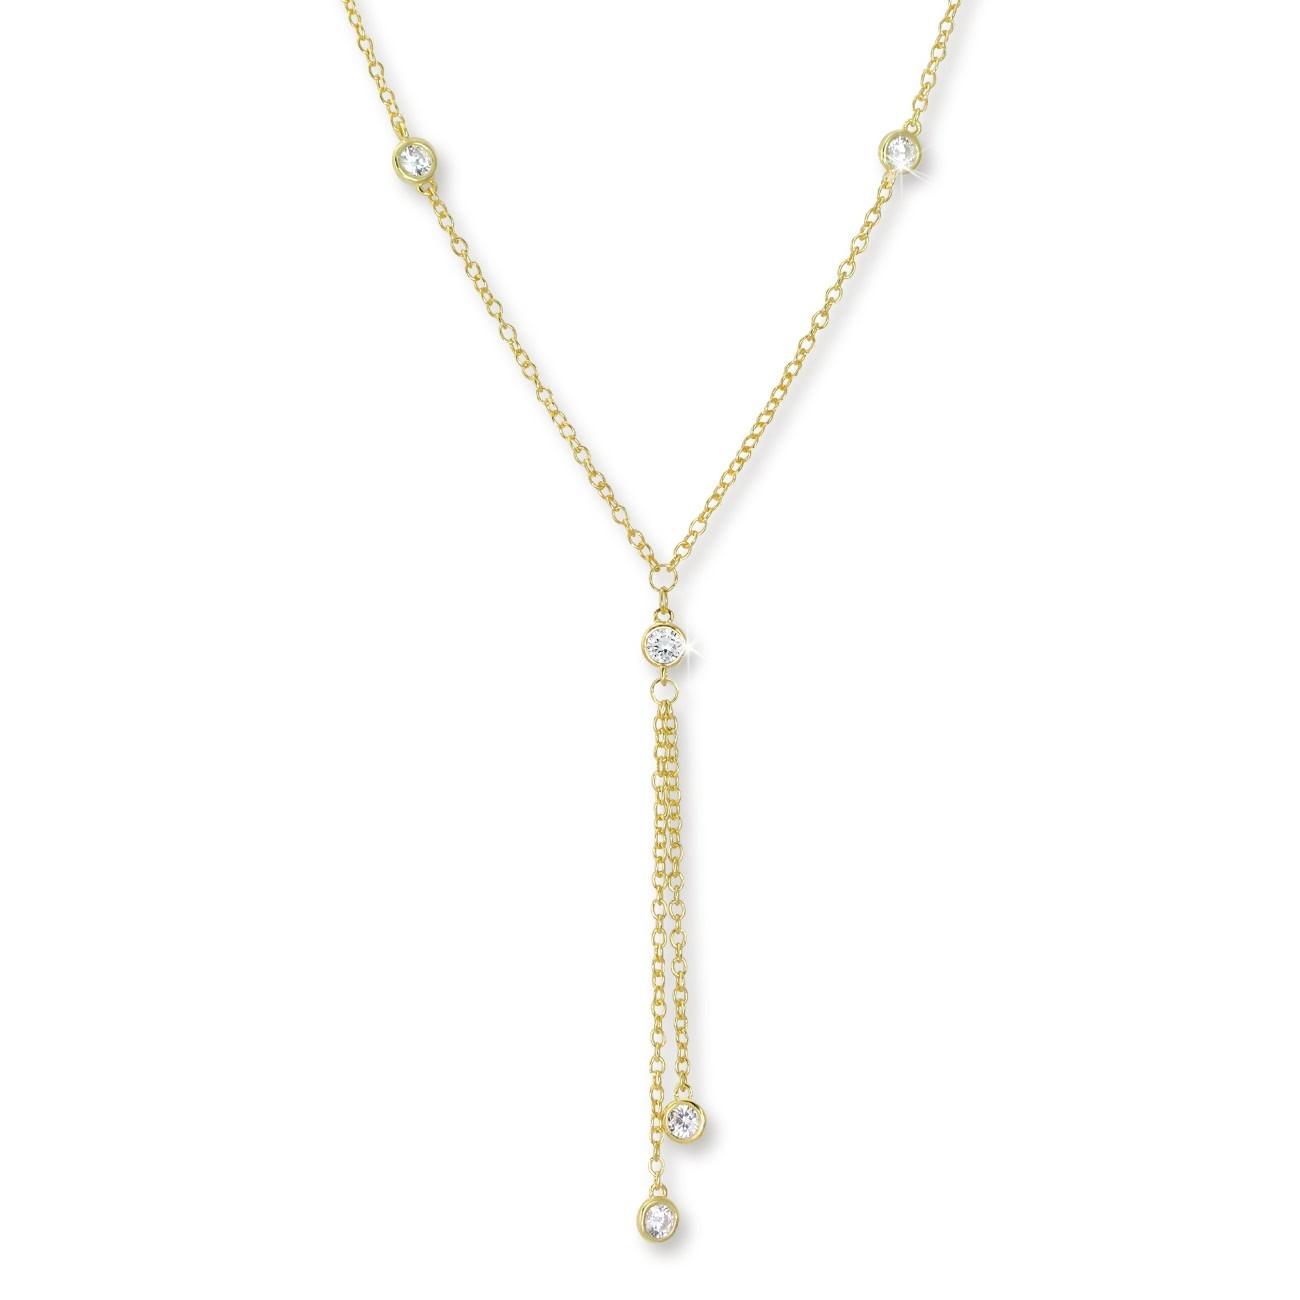 SilberDream Collier Kette vergoldet Zirkonia 925er Silber Damen 45cm SDK27845Y